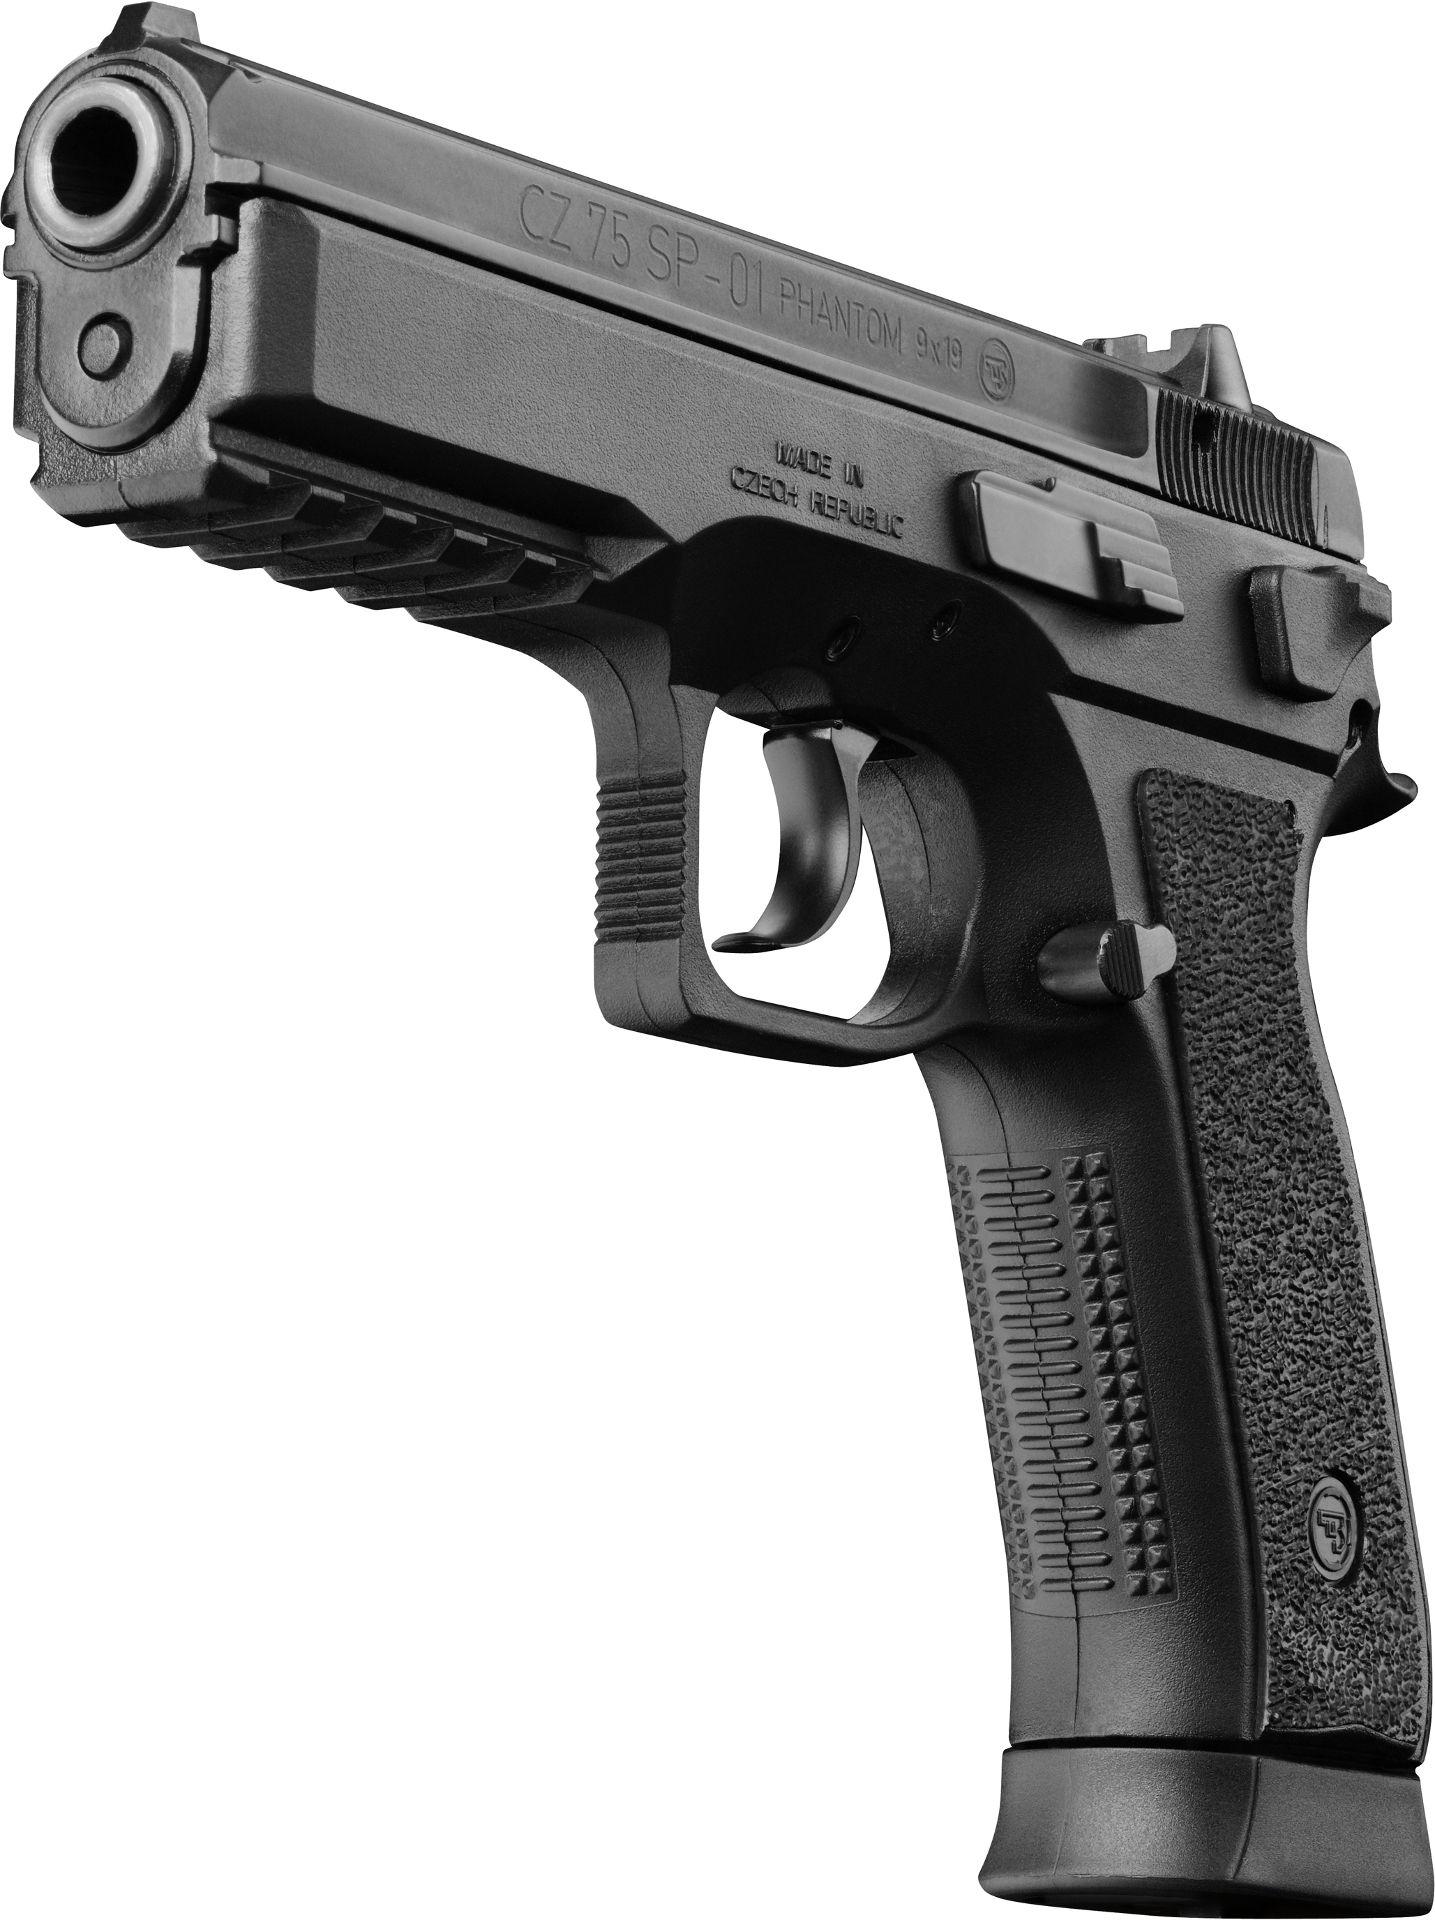 Pin by RAE Industries on cz | Guns, Tactical pistol, Hand guns